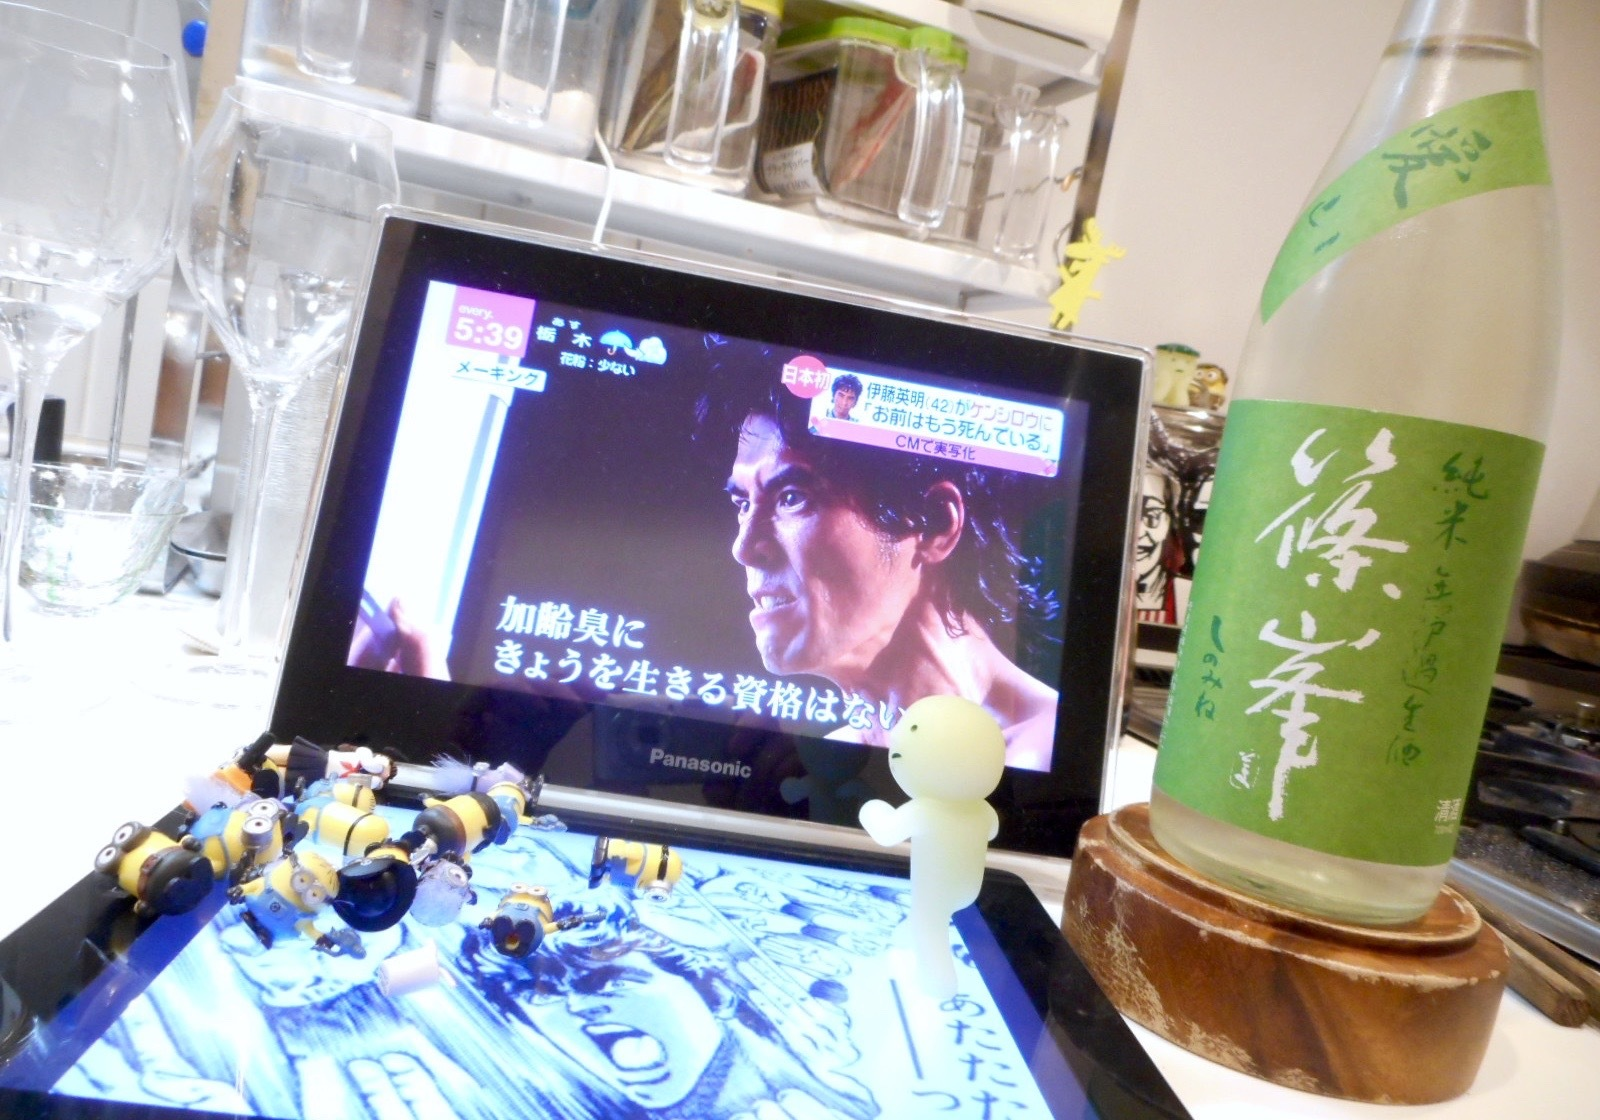 shinomine_aiyama66_29by1.jpg